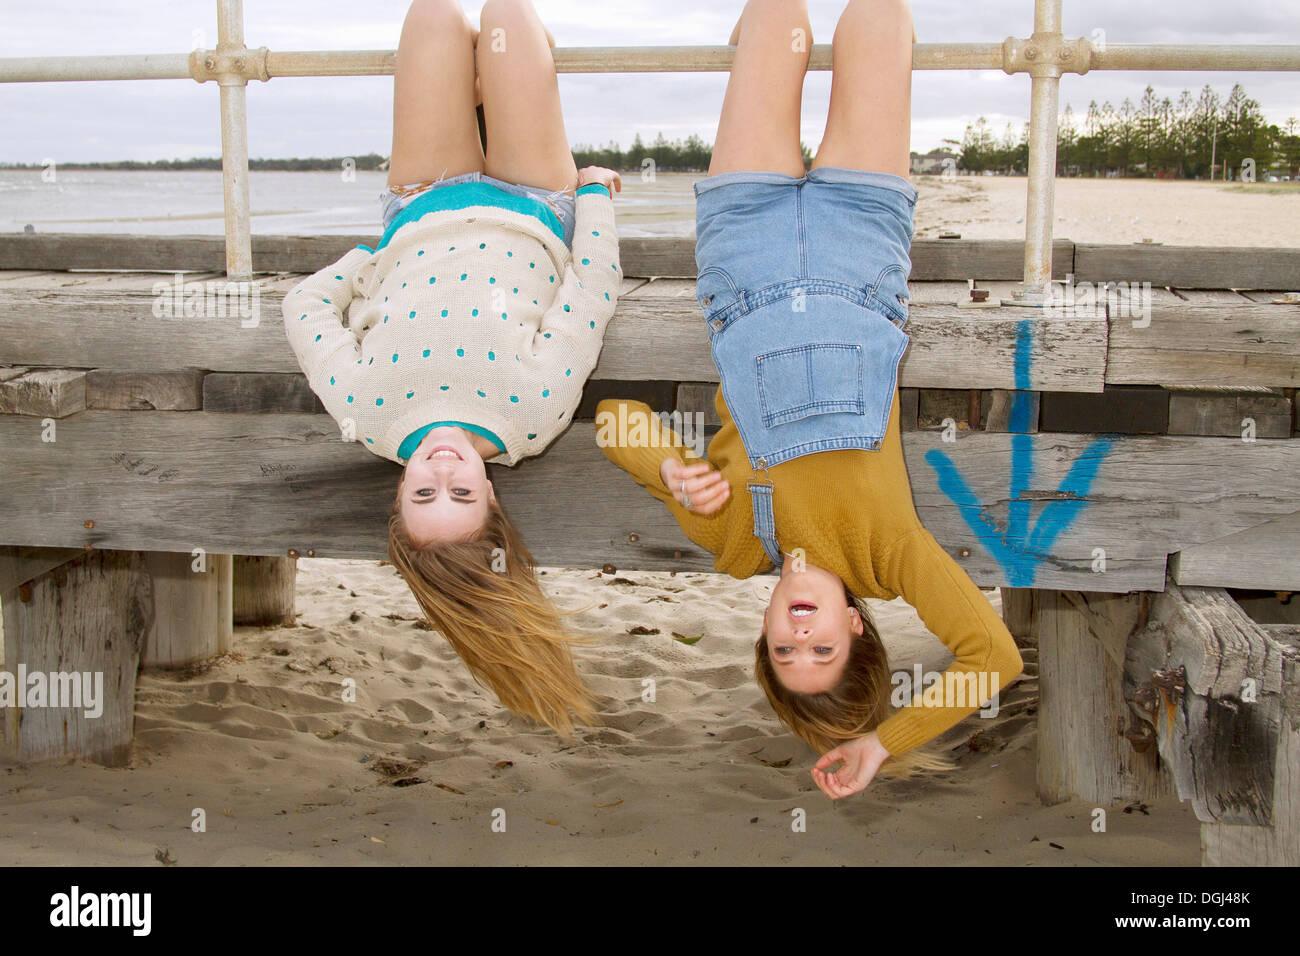 Freundinnen kopfüber vom pier Stockbild